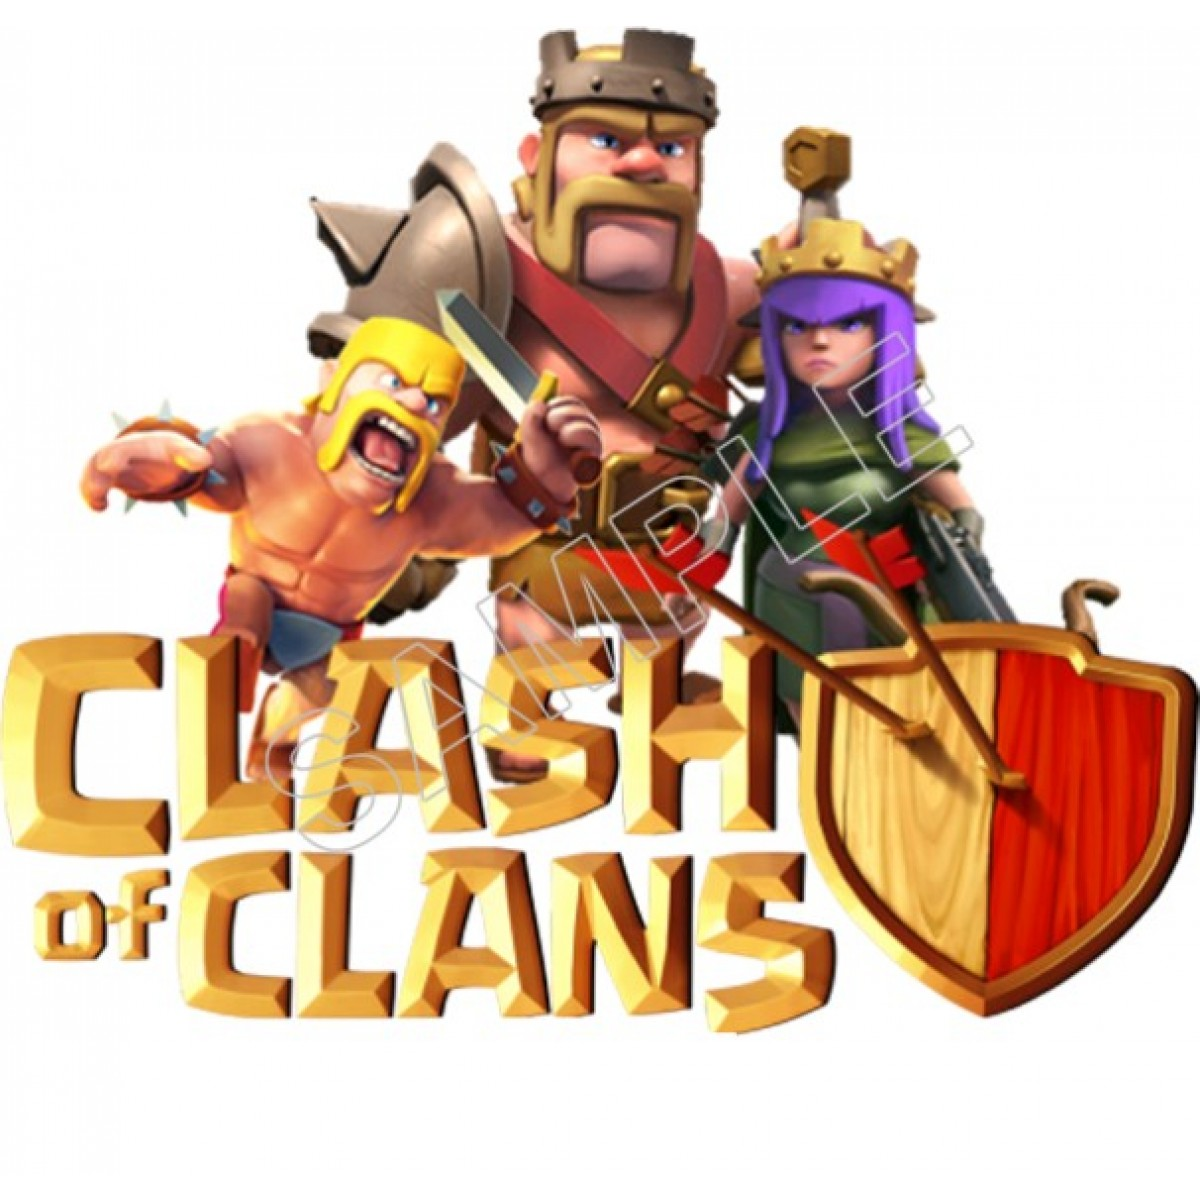 Clash of clans androzen tpk download for tizen phone || androzen tpk store || googleupload.com